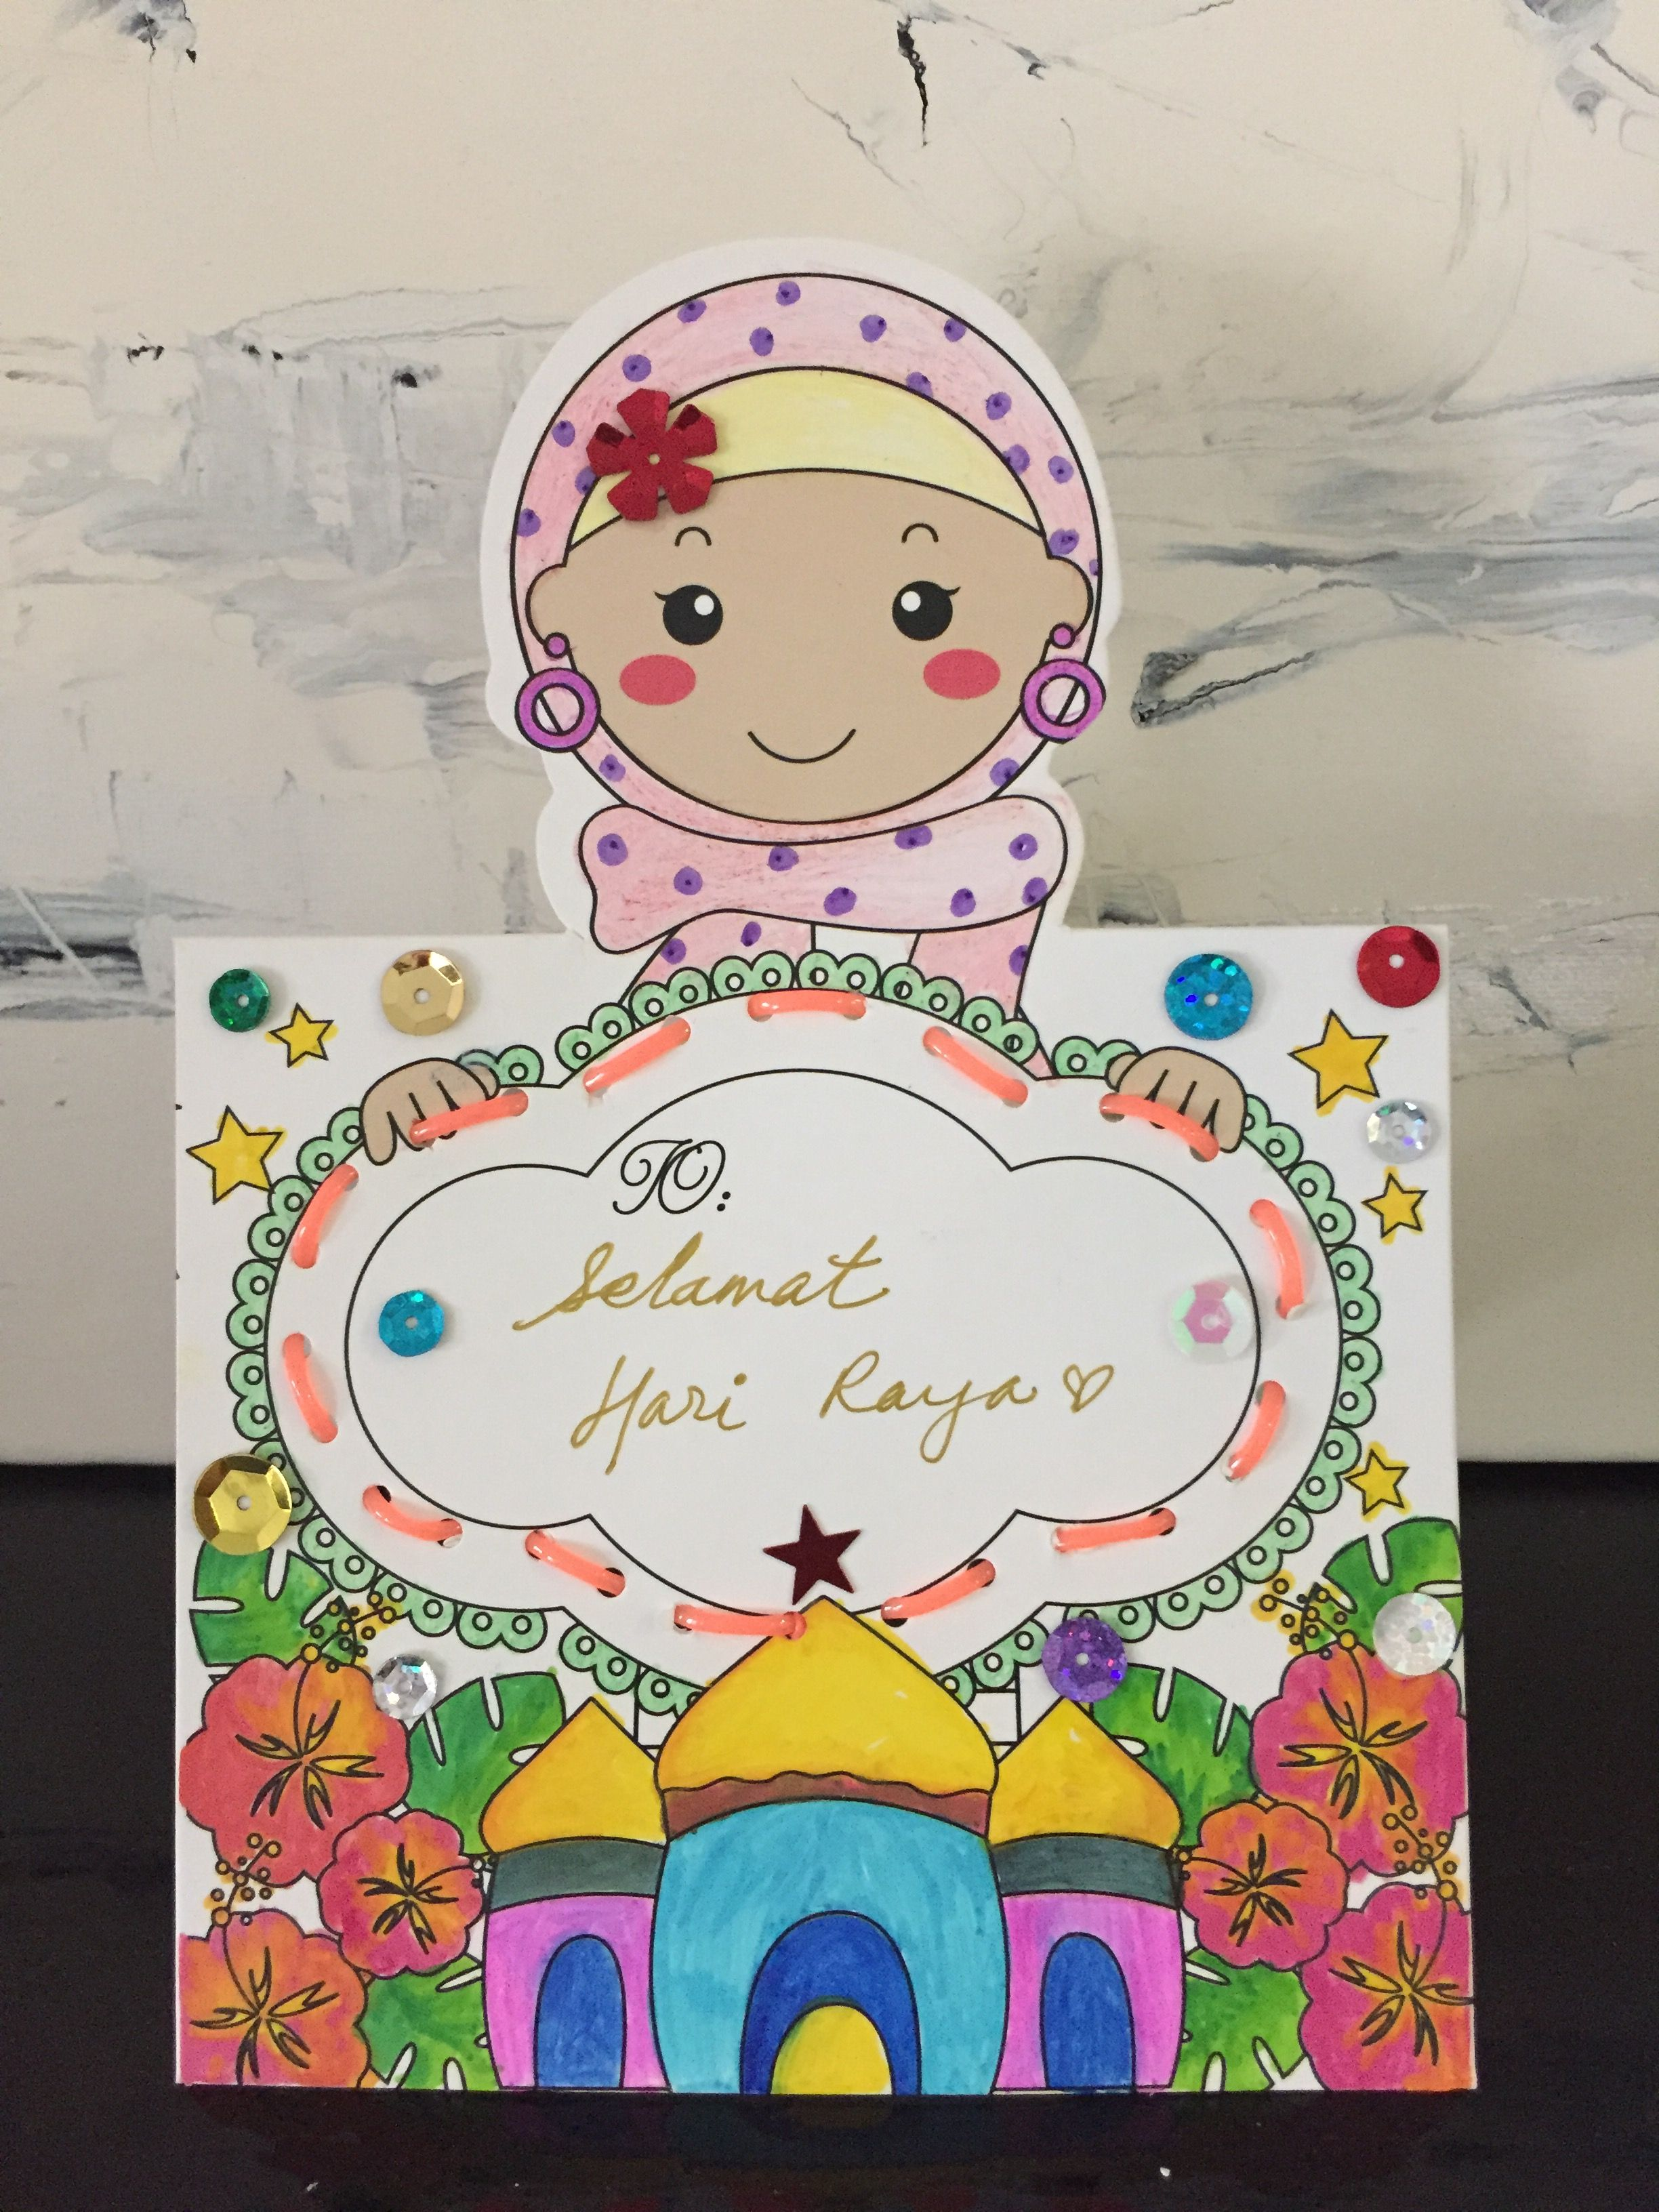 Cartoon Hari Raya Greeting Card Www Fun4kids Com My Ramadan Crafts Kindergarten Crafts Crafts For Kids